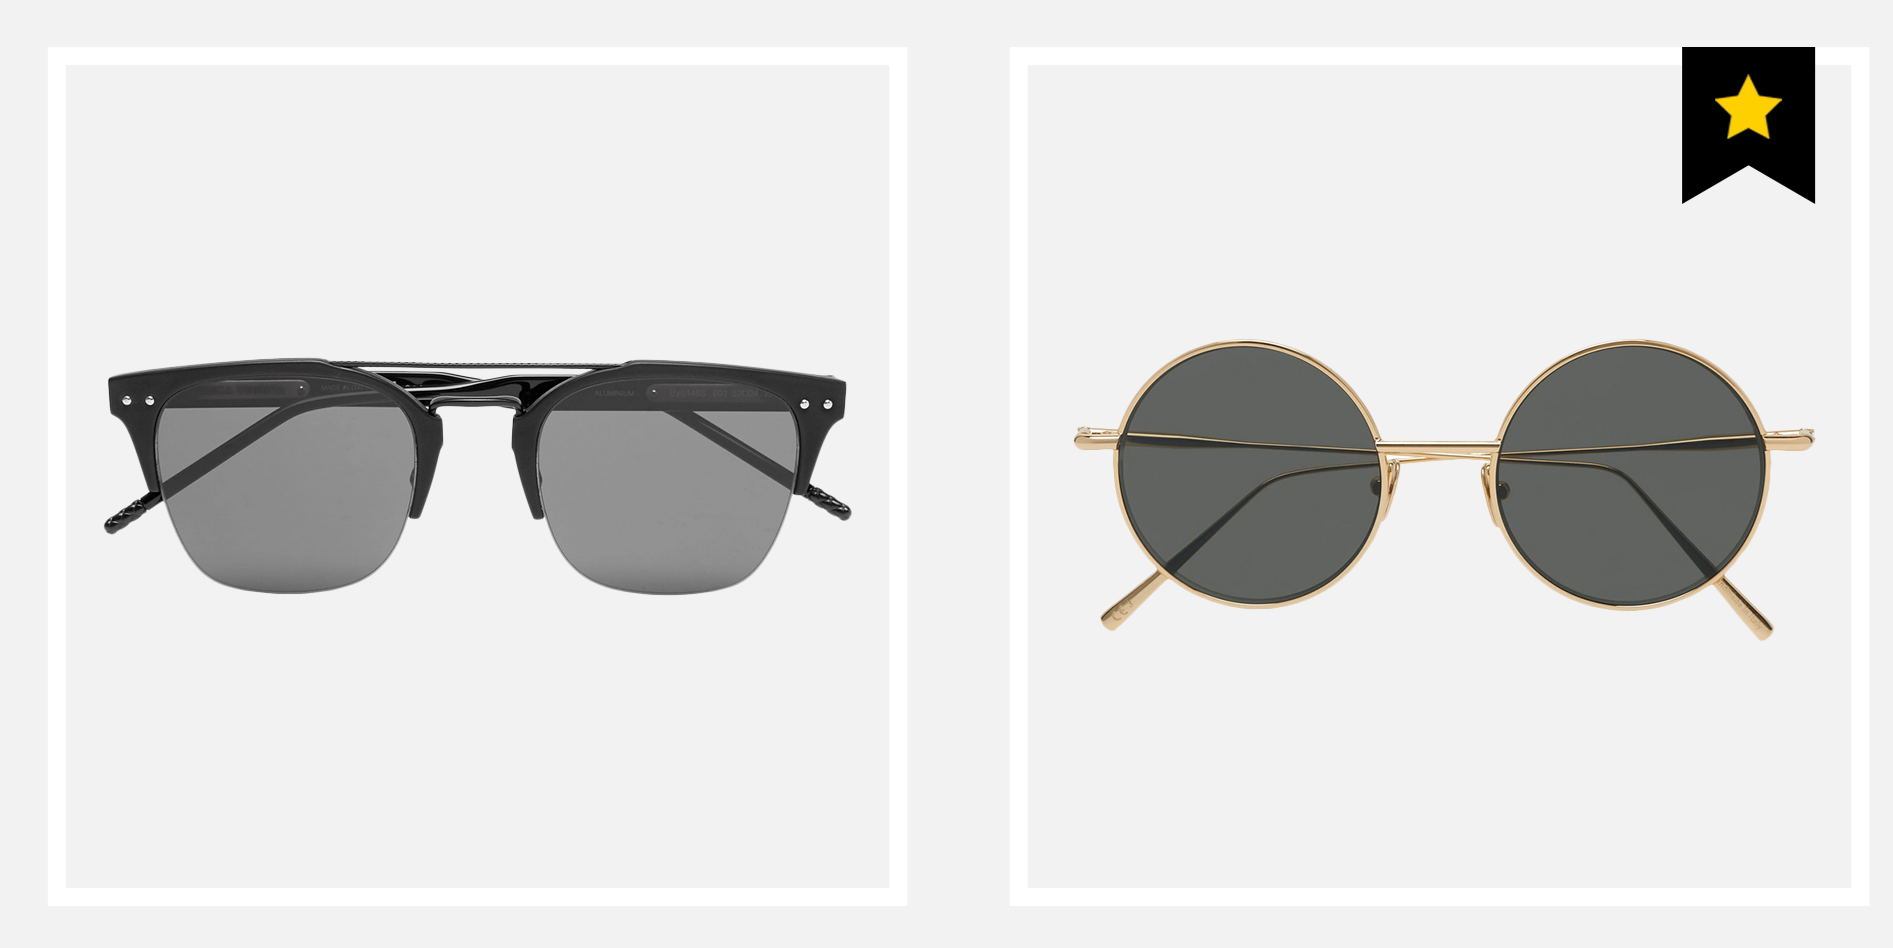 cfa350881f 15 γυαλιά ηλίου για να διαλέξεις το δικό σου σχήμα